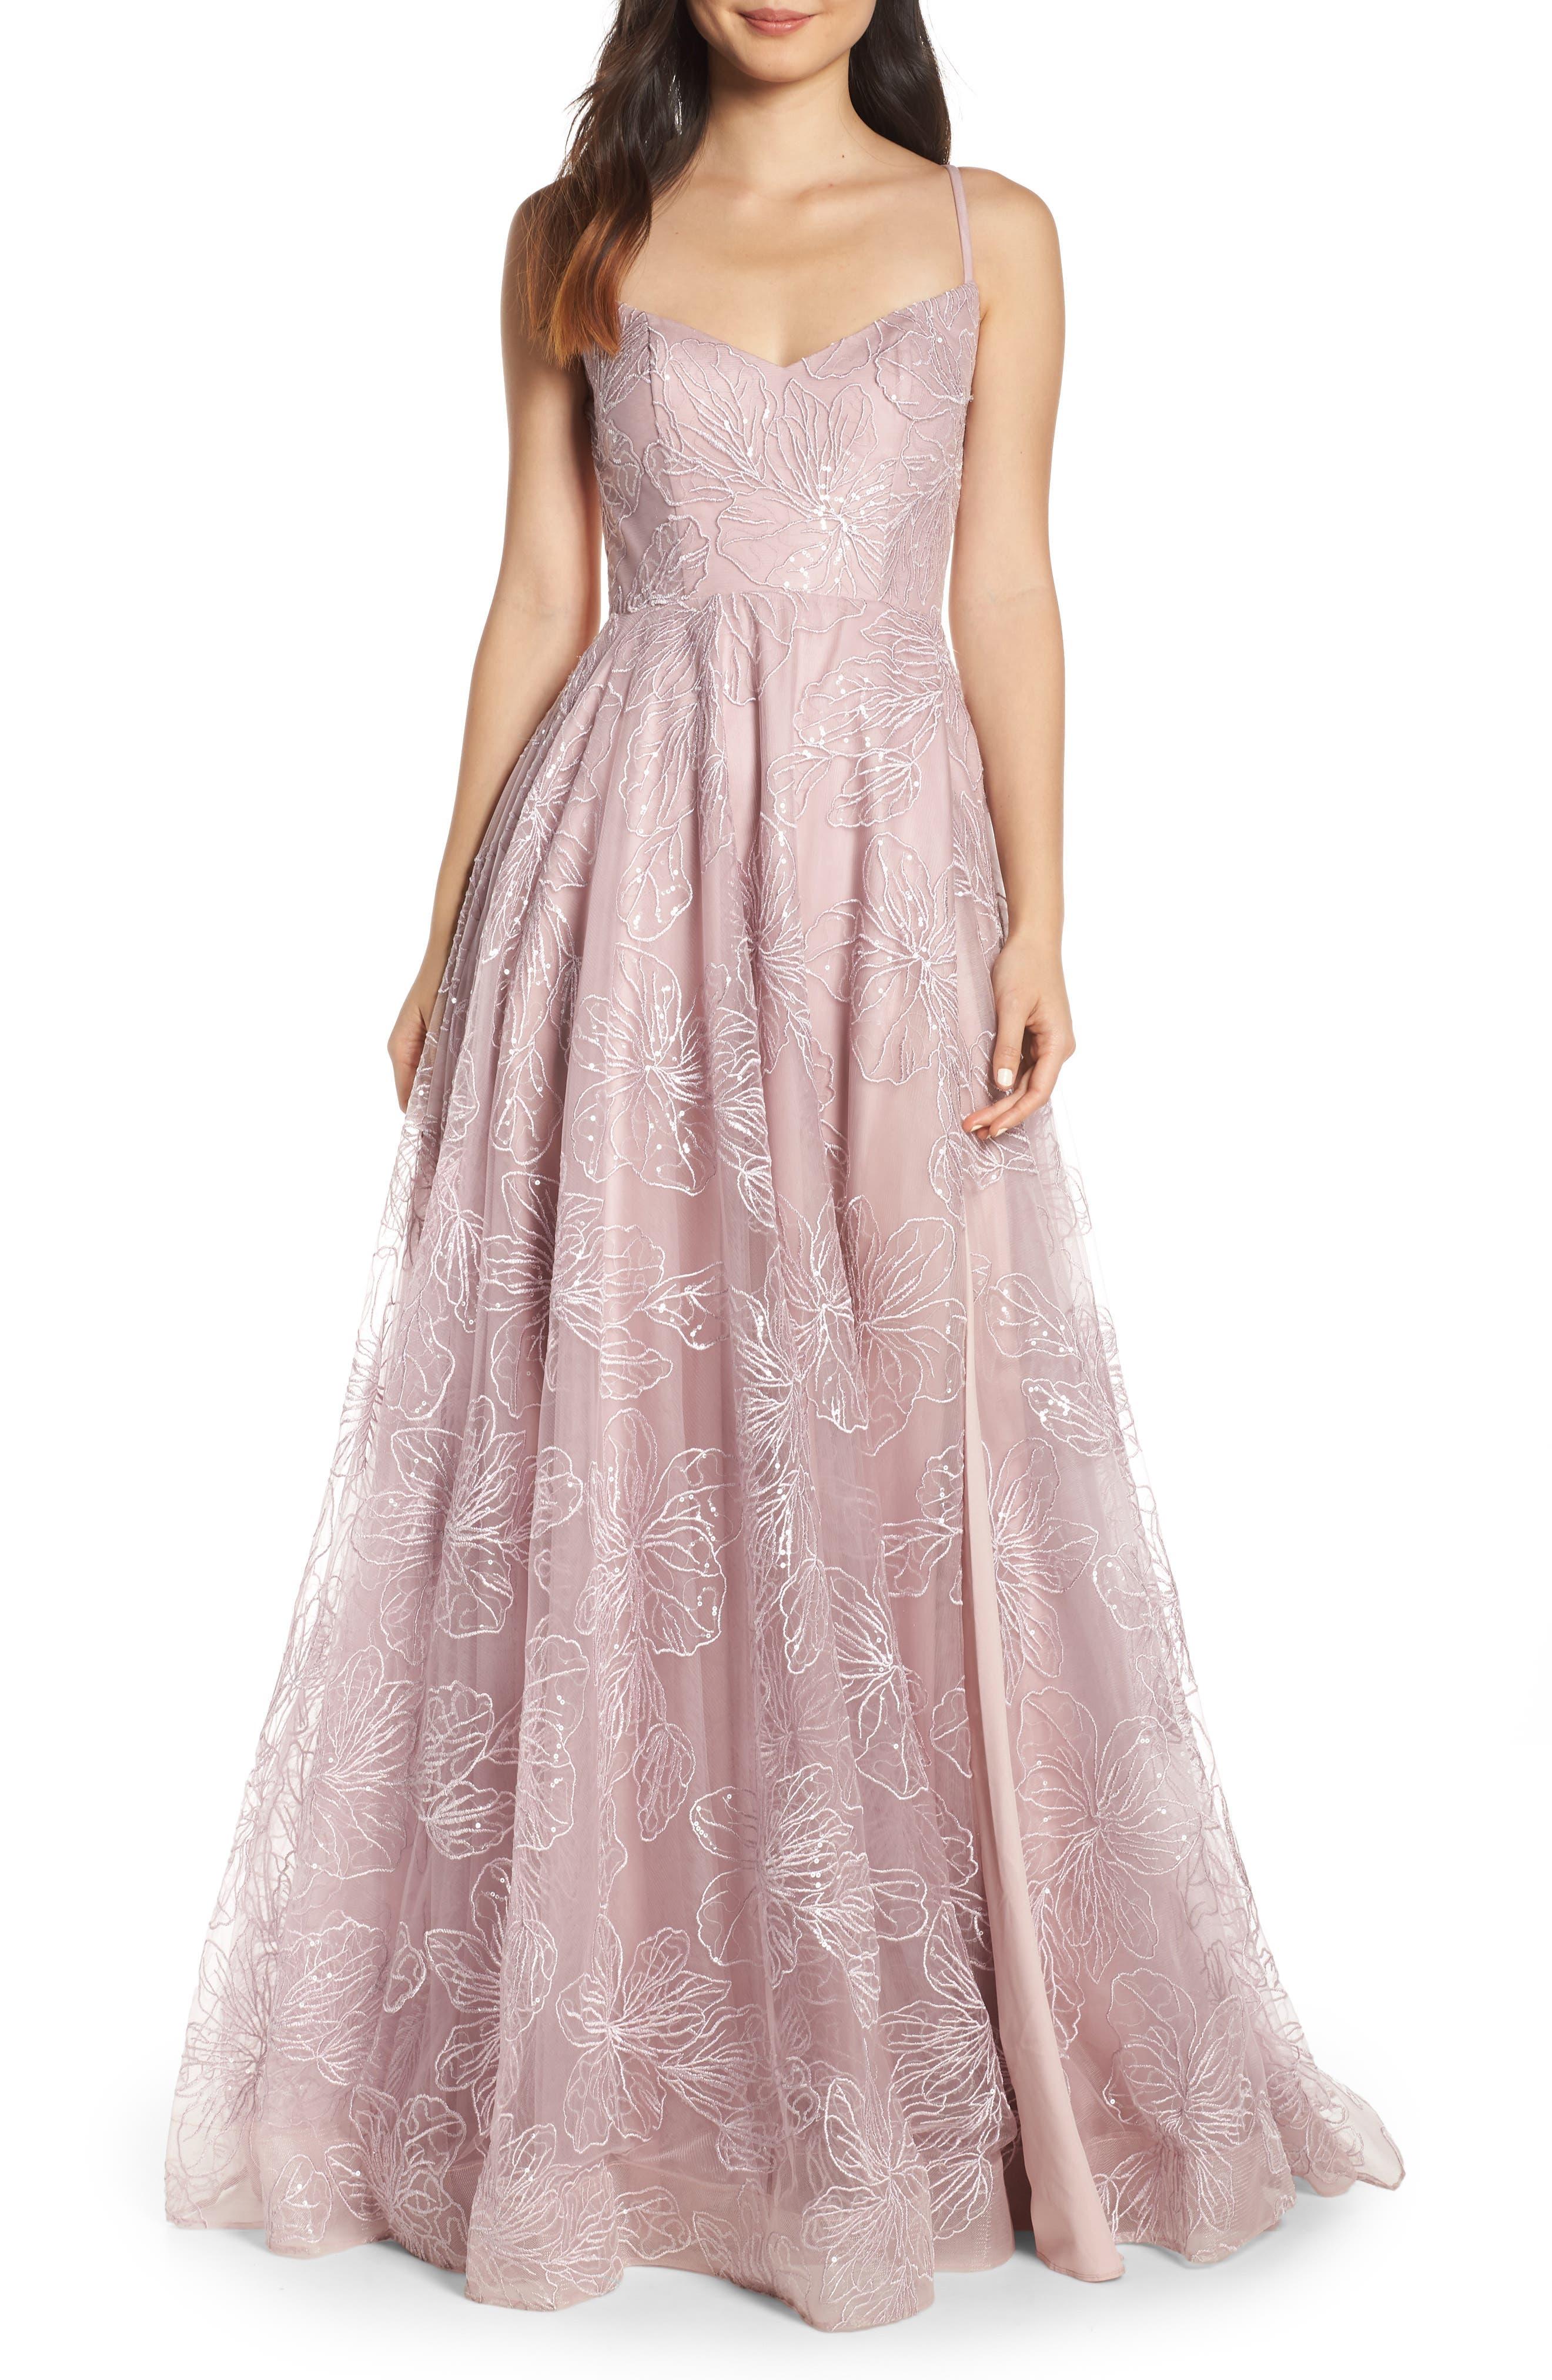 LA FEMME, Metallic Floral Embellished Evening Dress, Main thumbnail 1, color, MAUVE